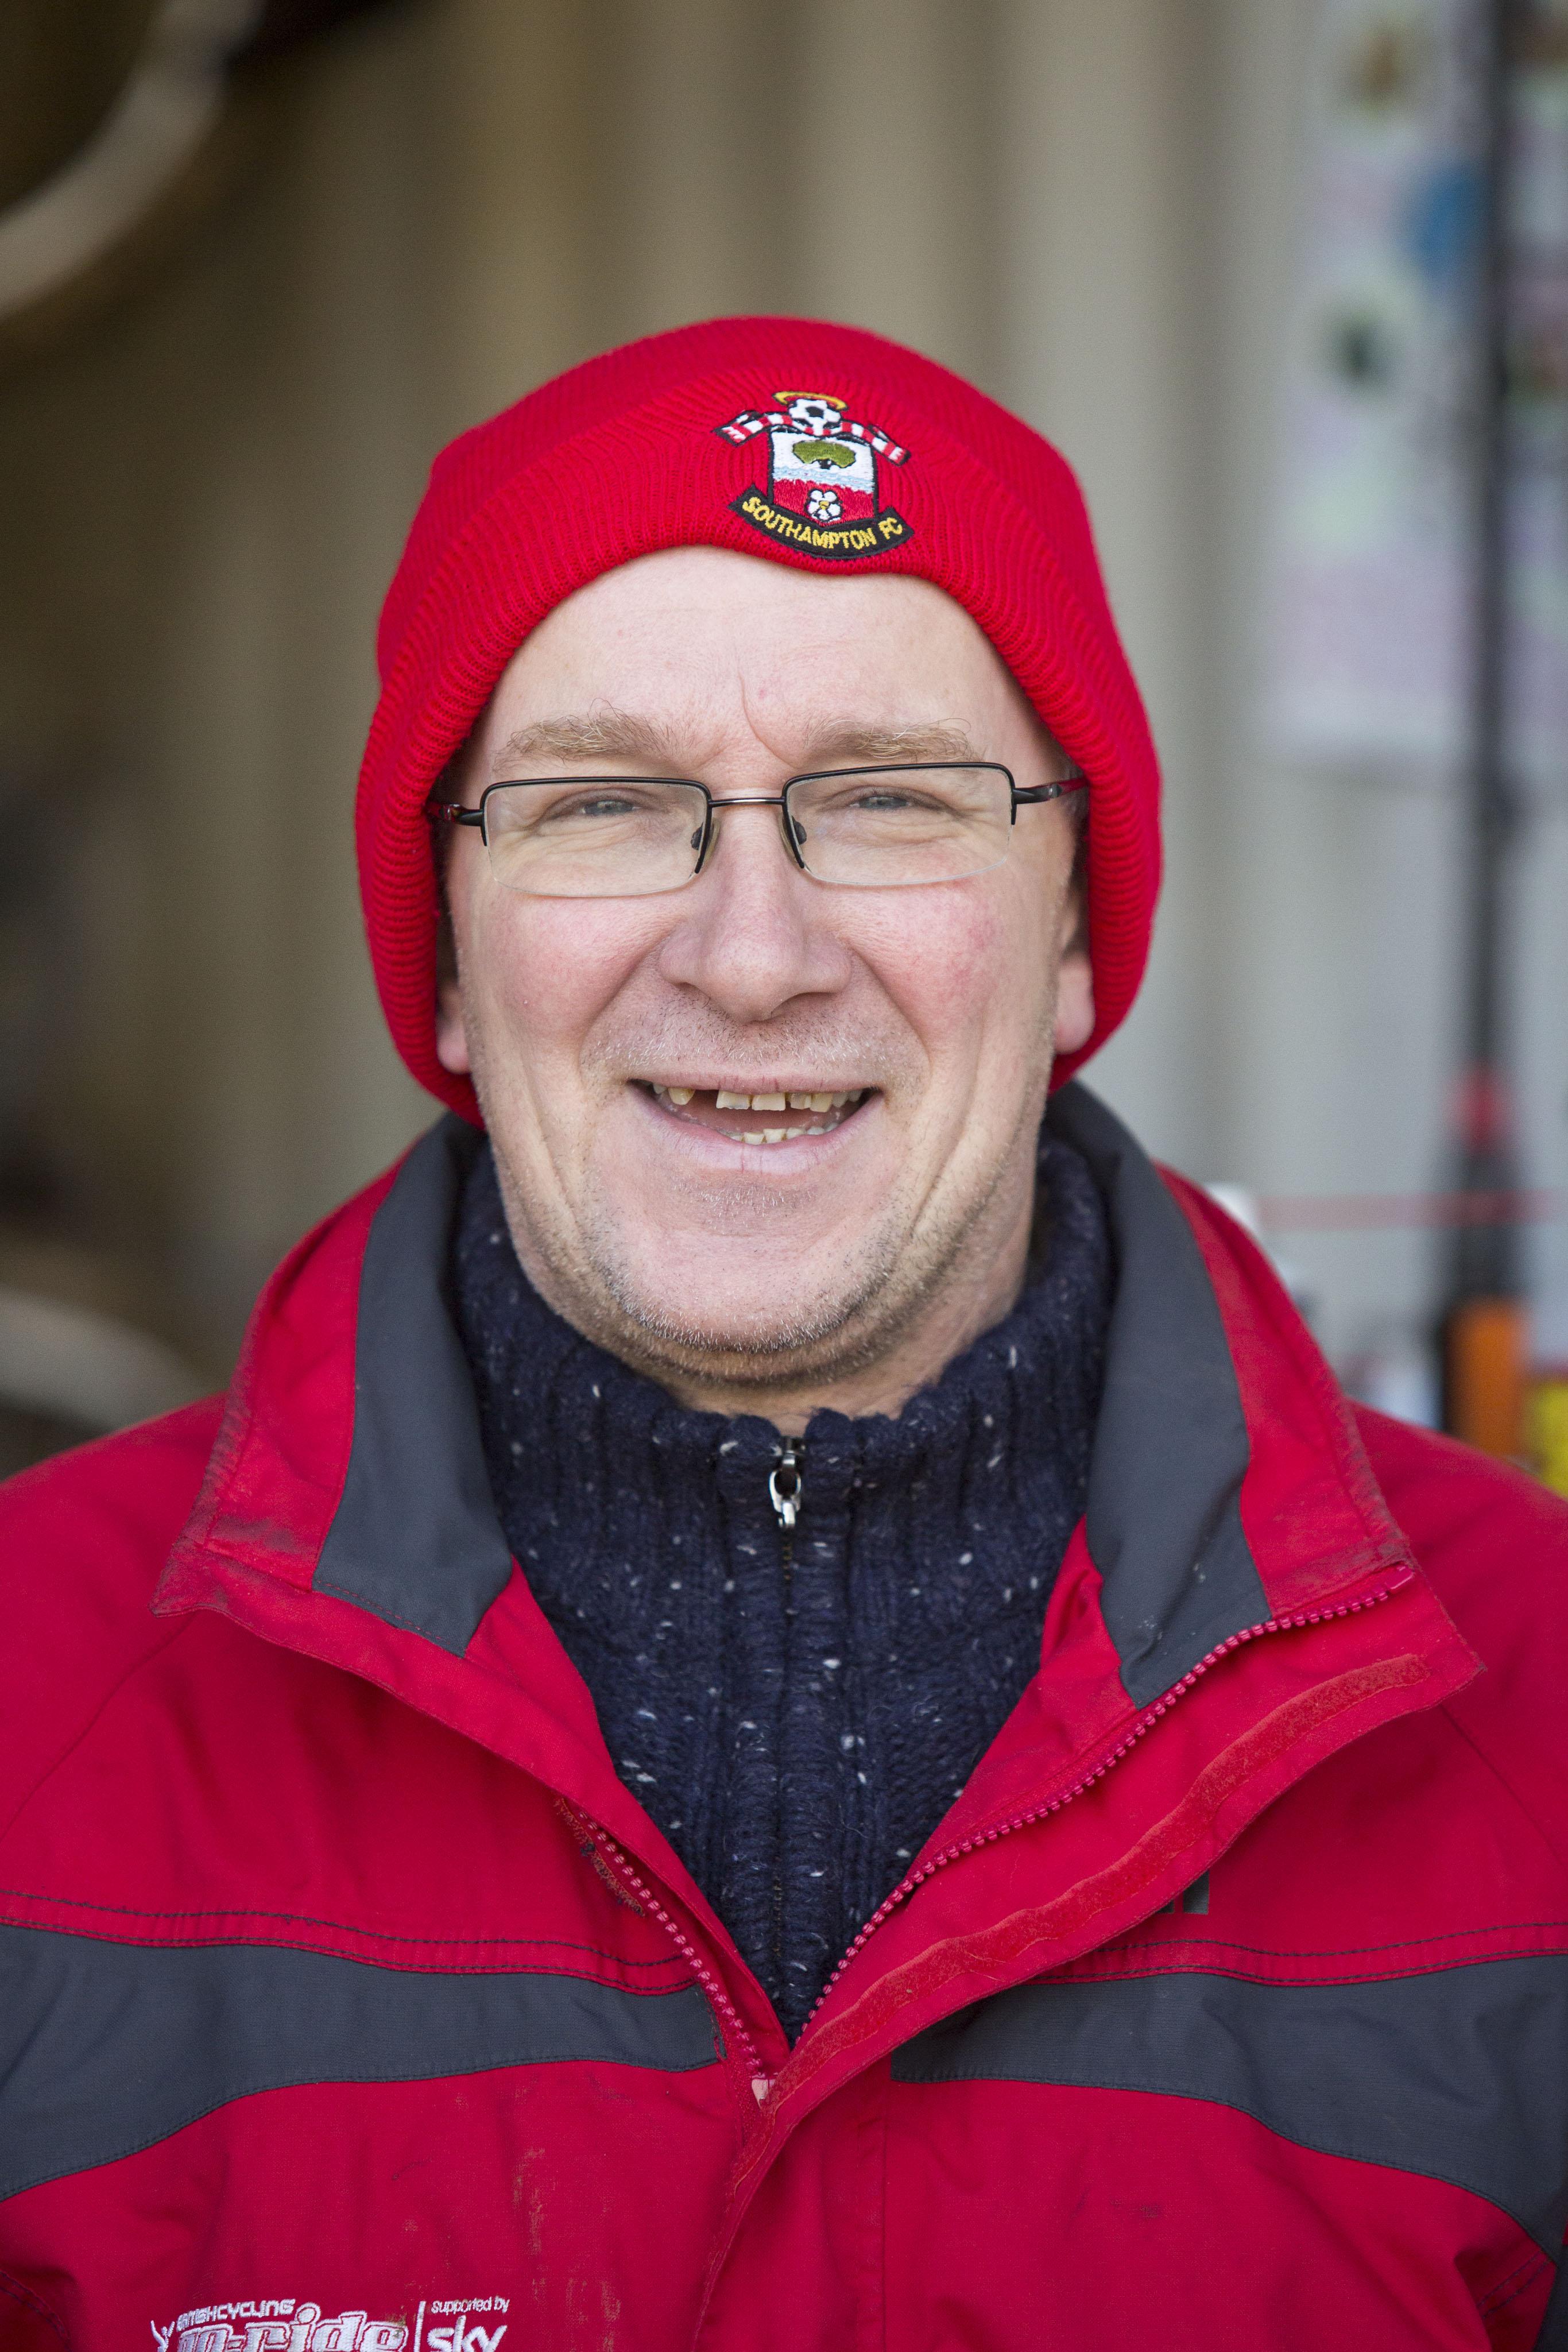 Clive Dawkins